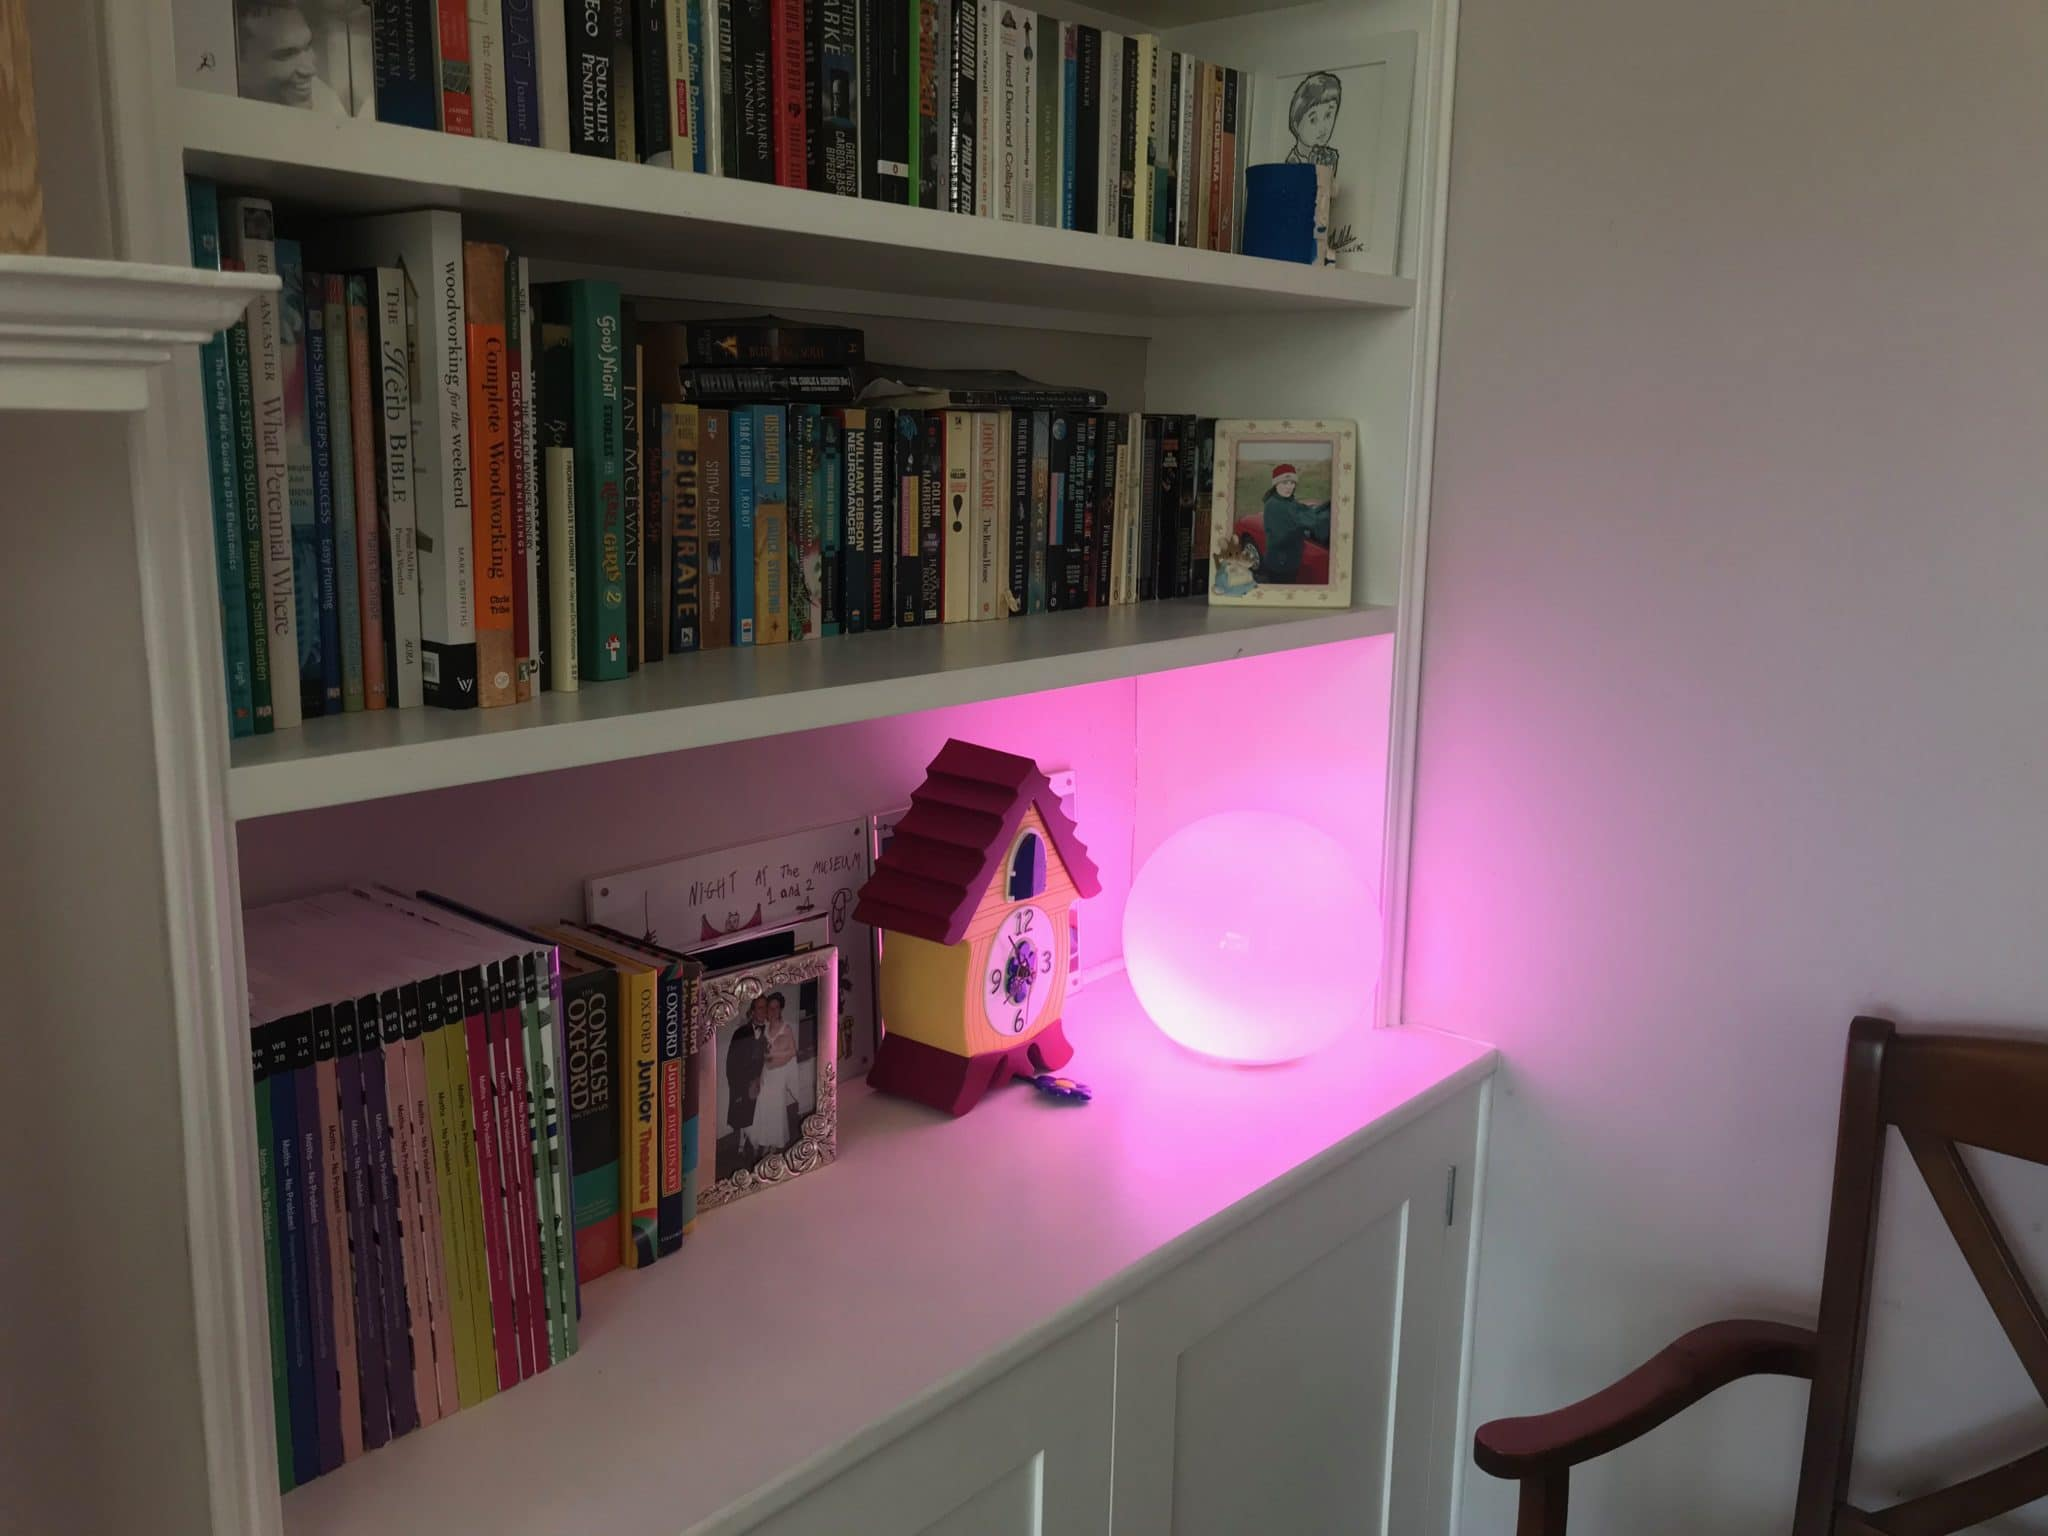 WLED light ball